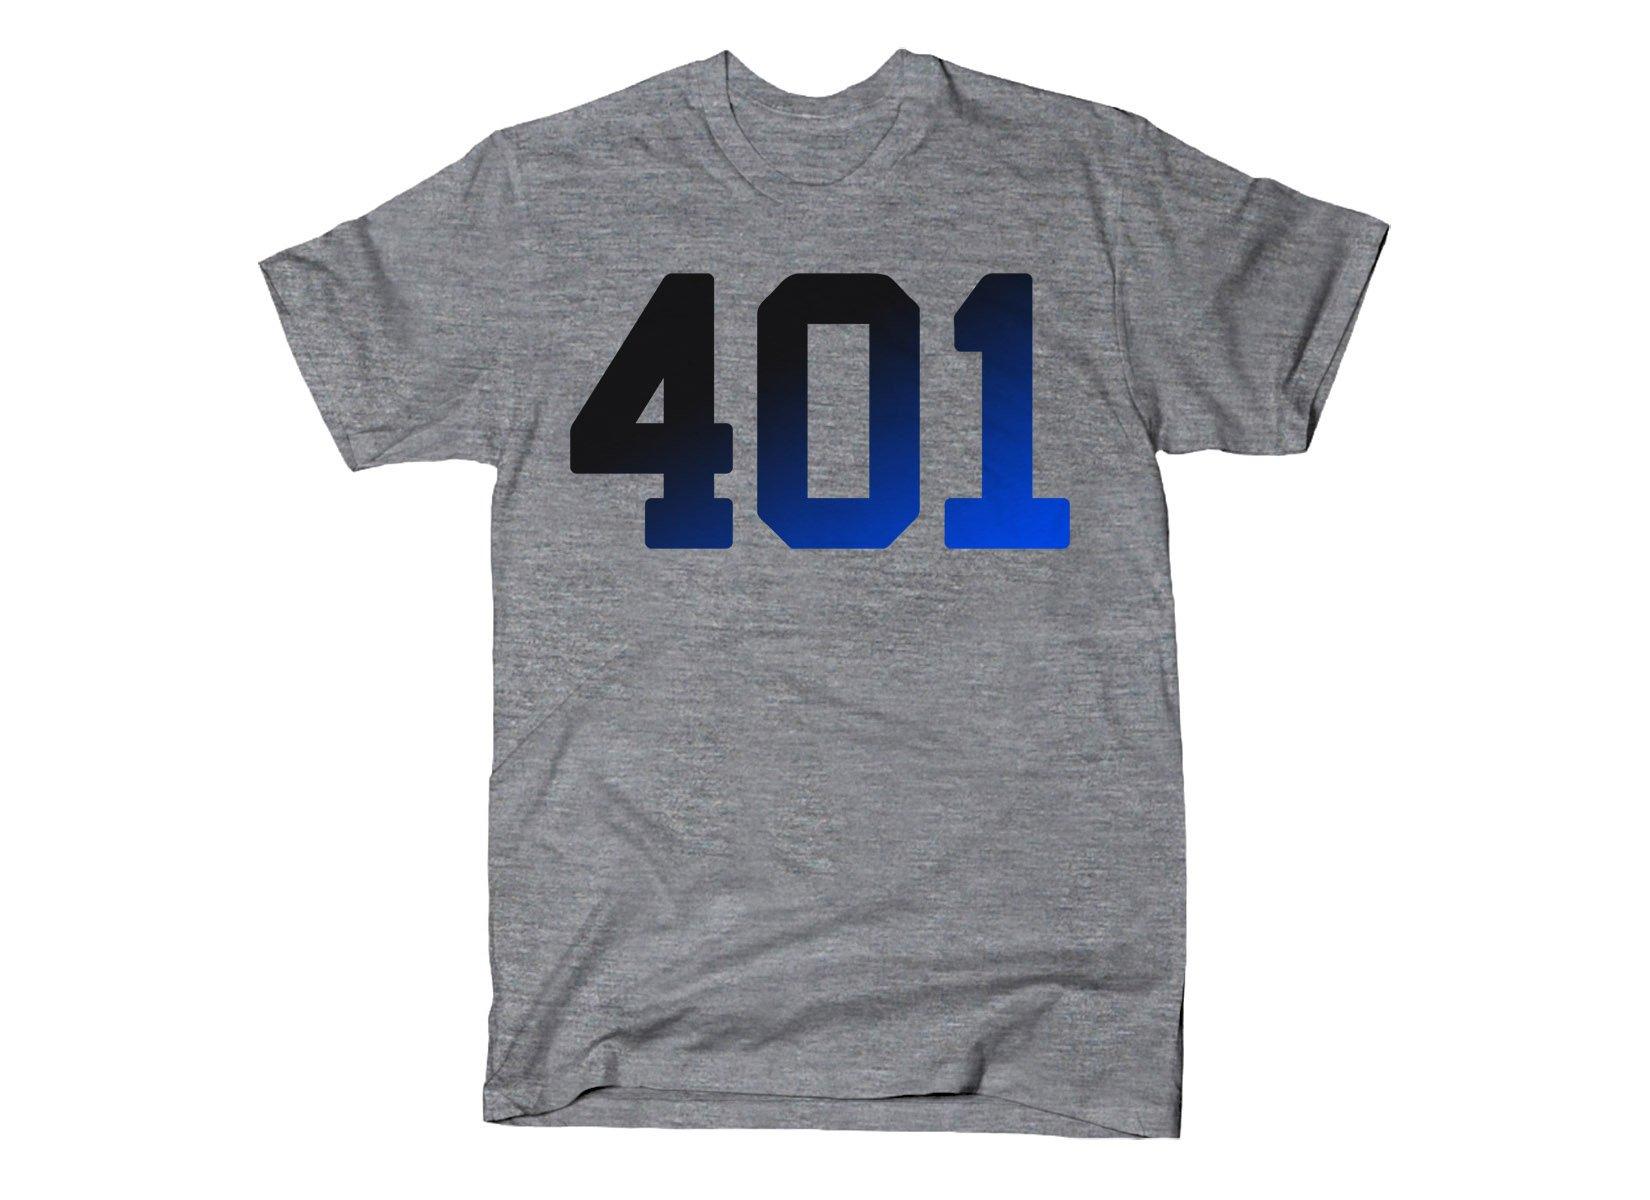 401 Rhode Island on Mens T-Shirt